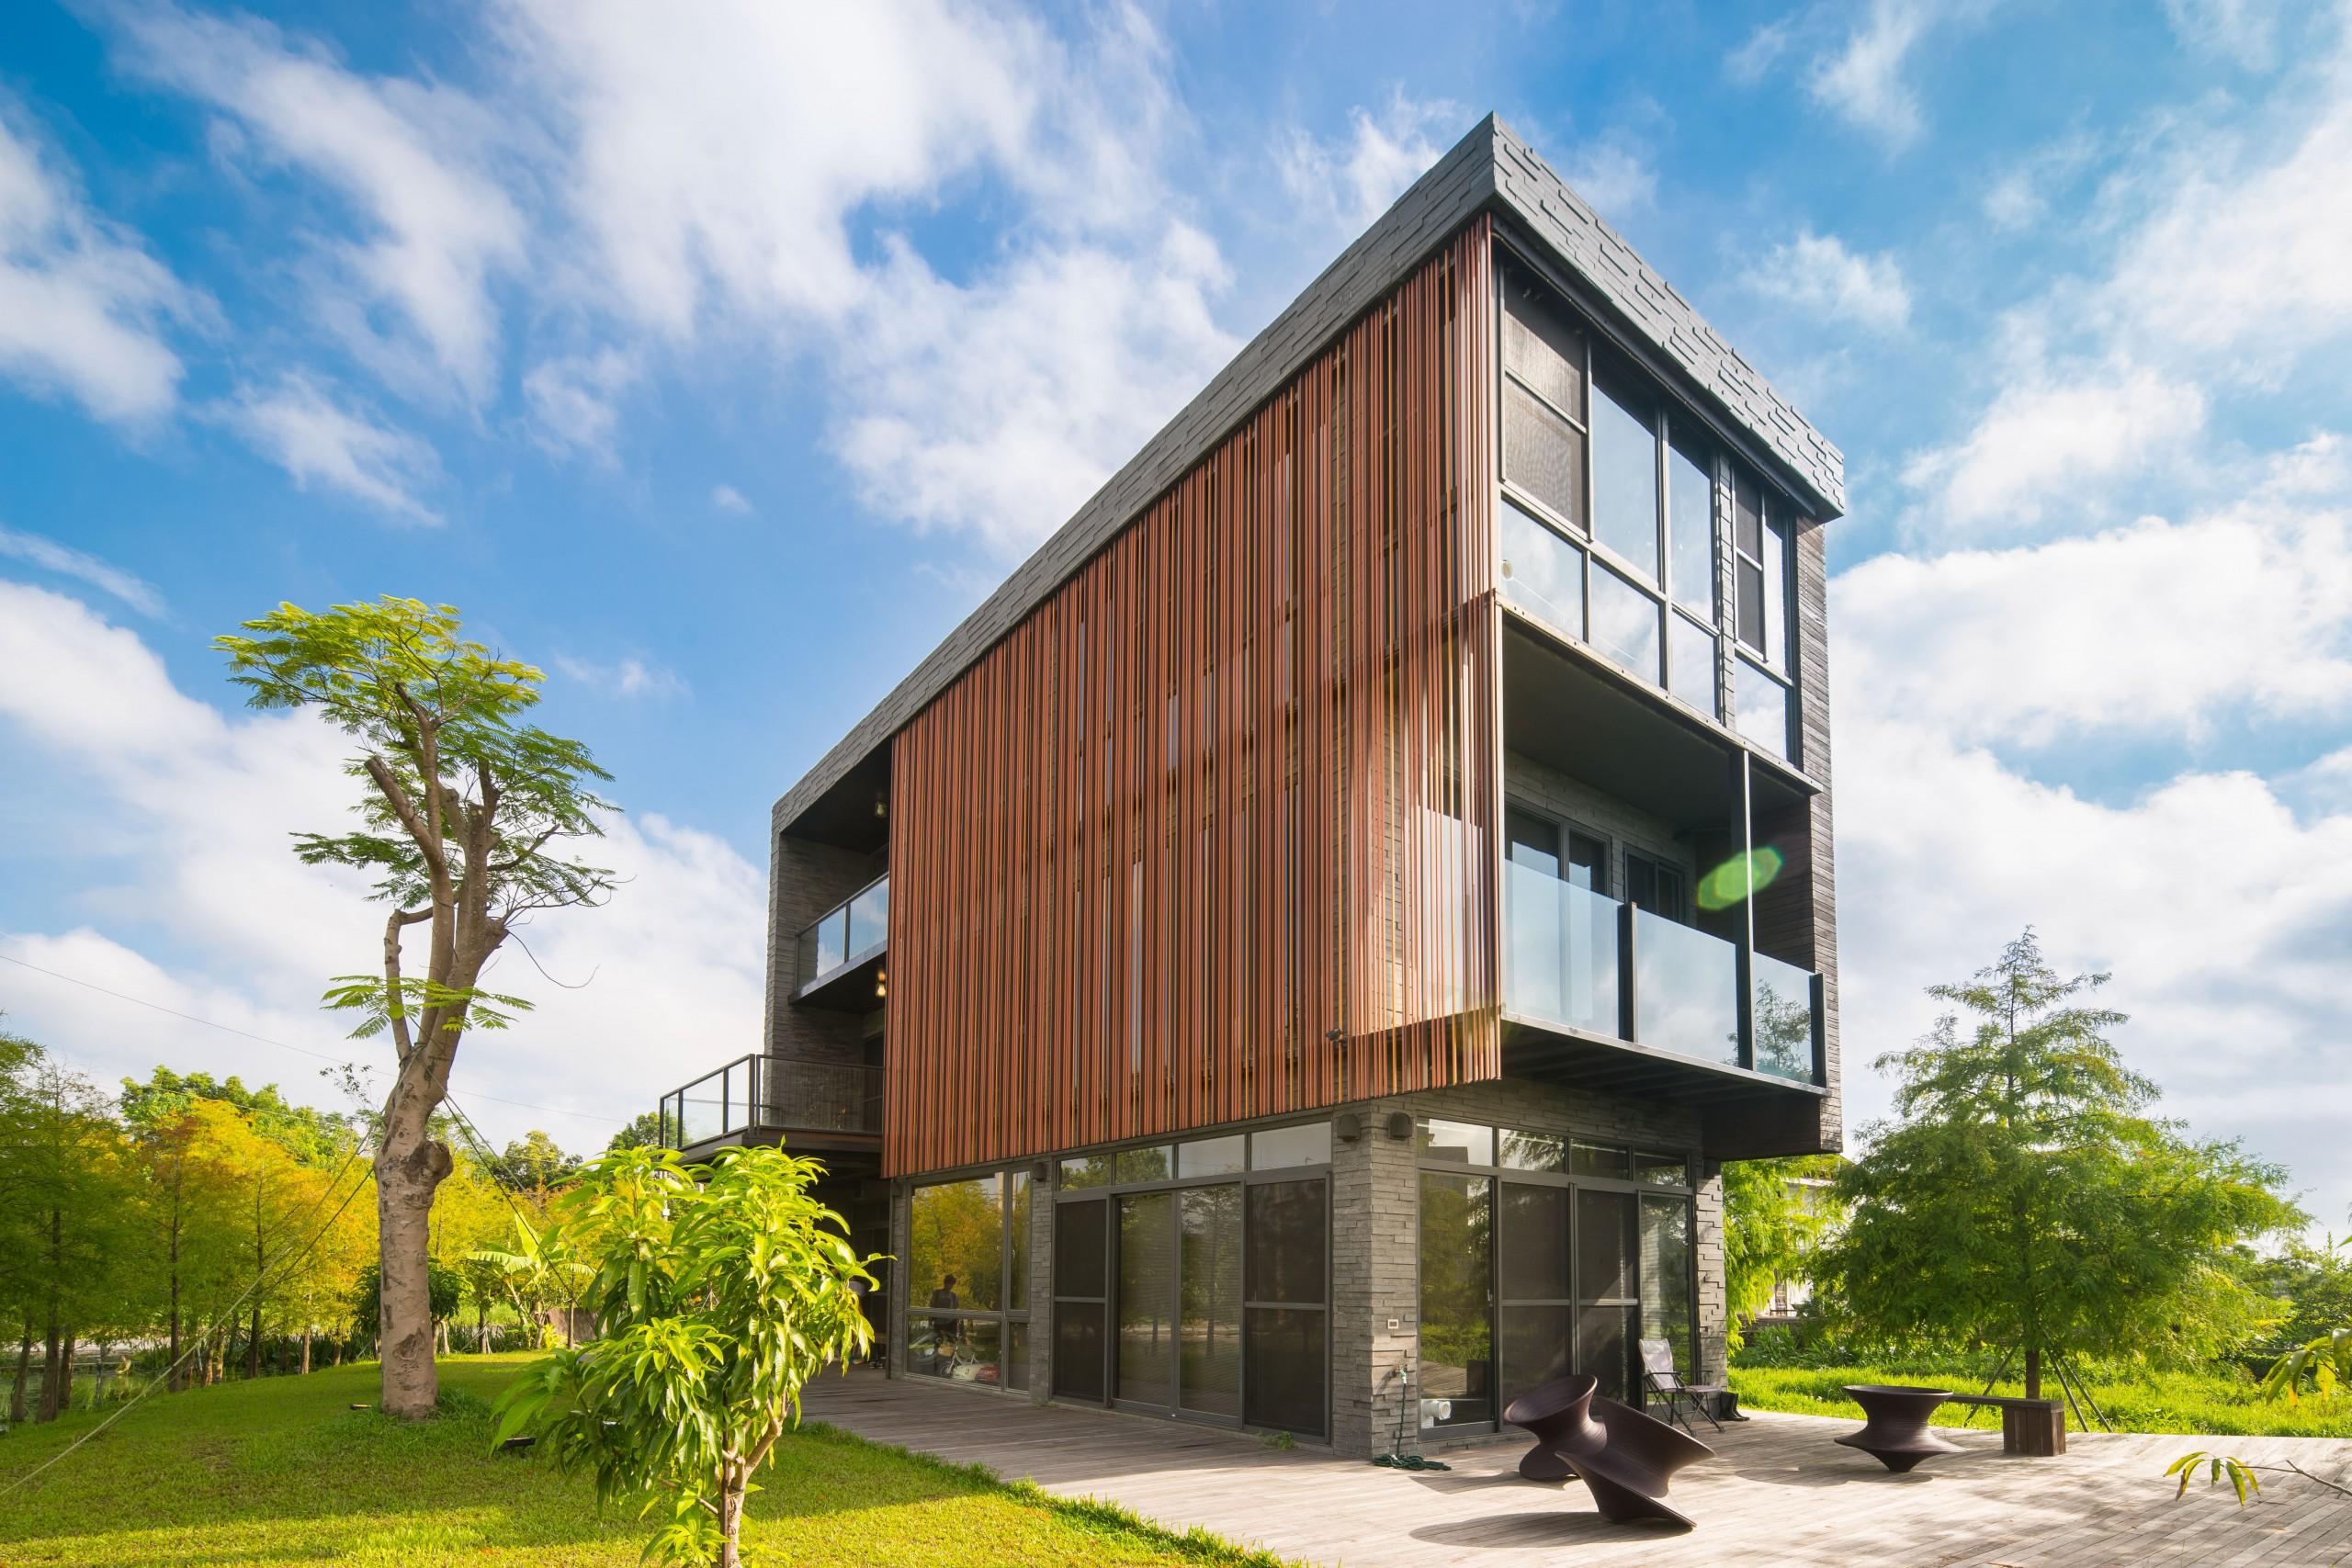 德築-DEZU-project-HAHouse秋-architecture-building-landscape-15